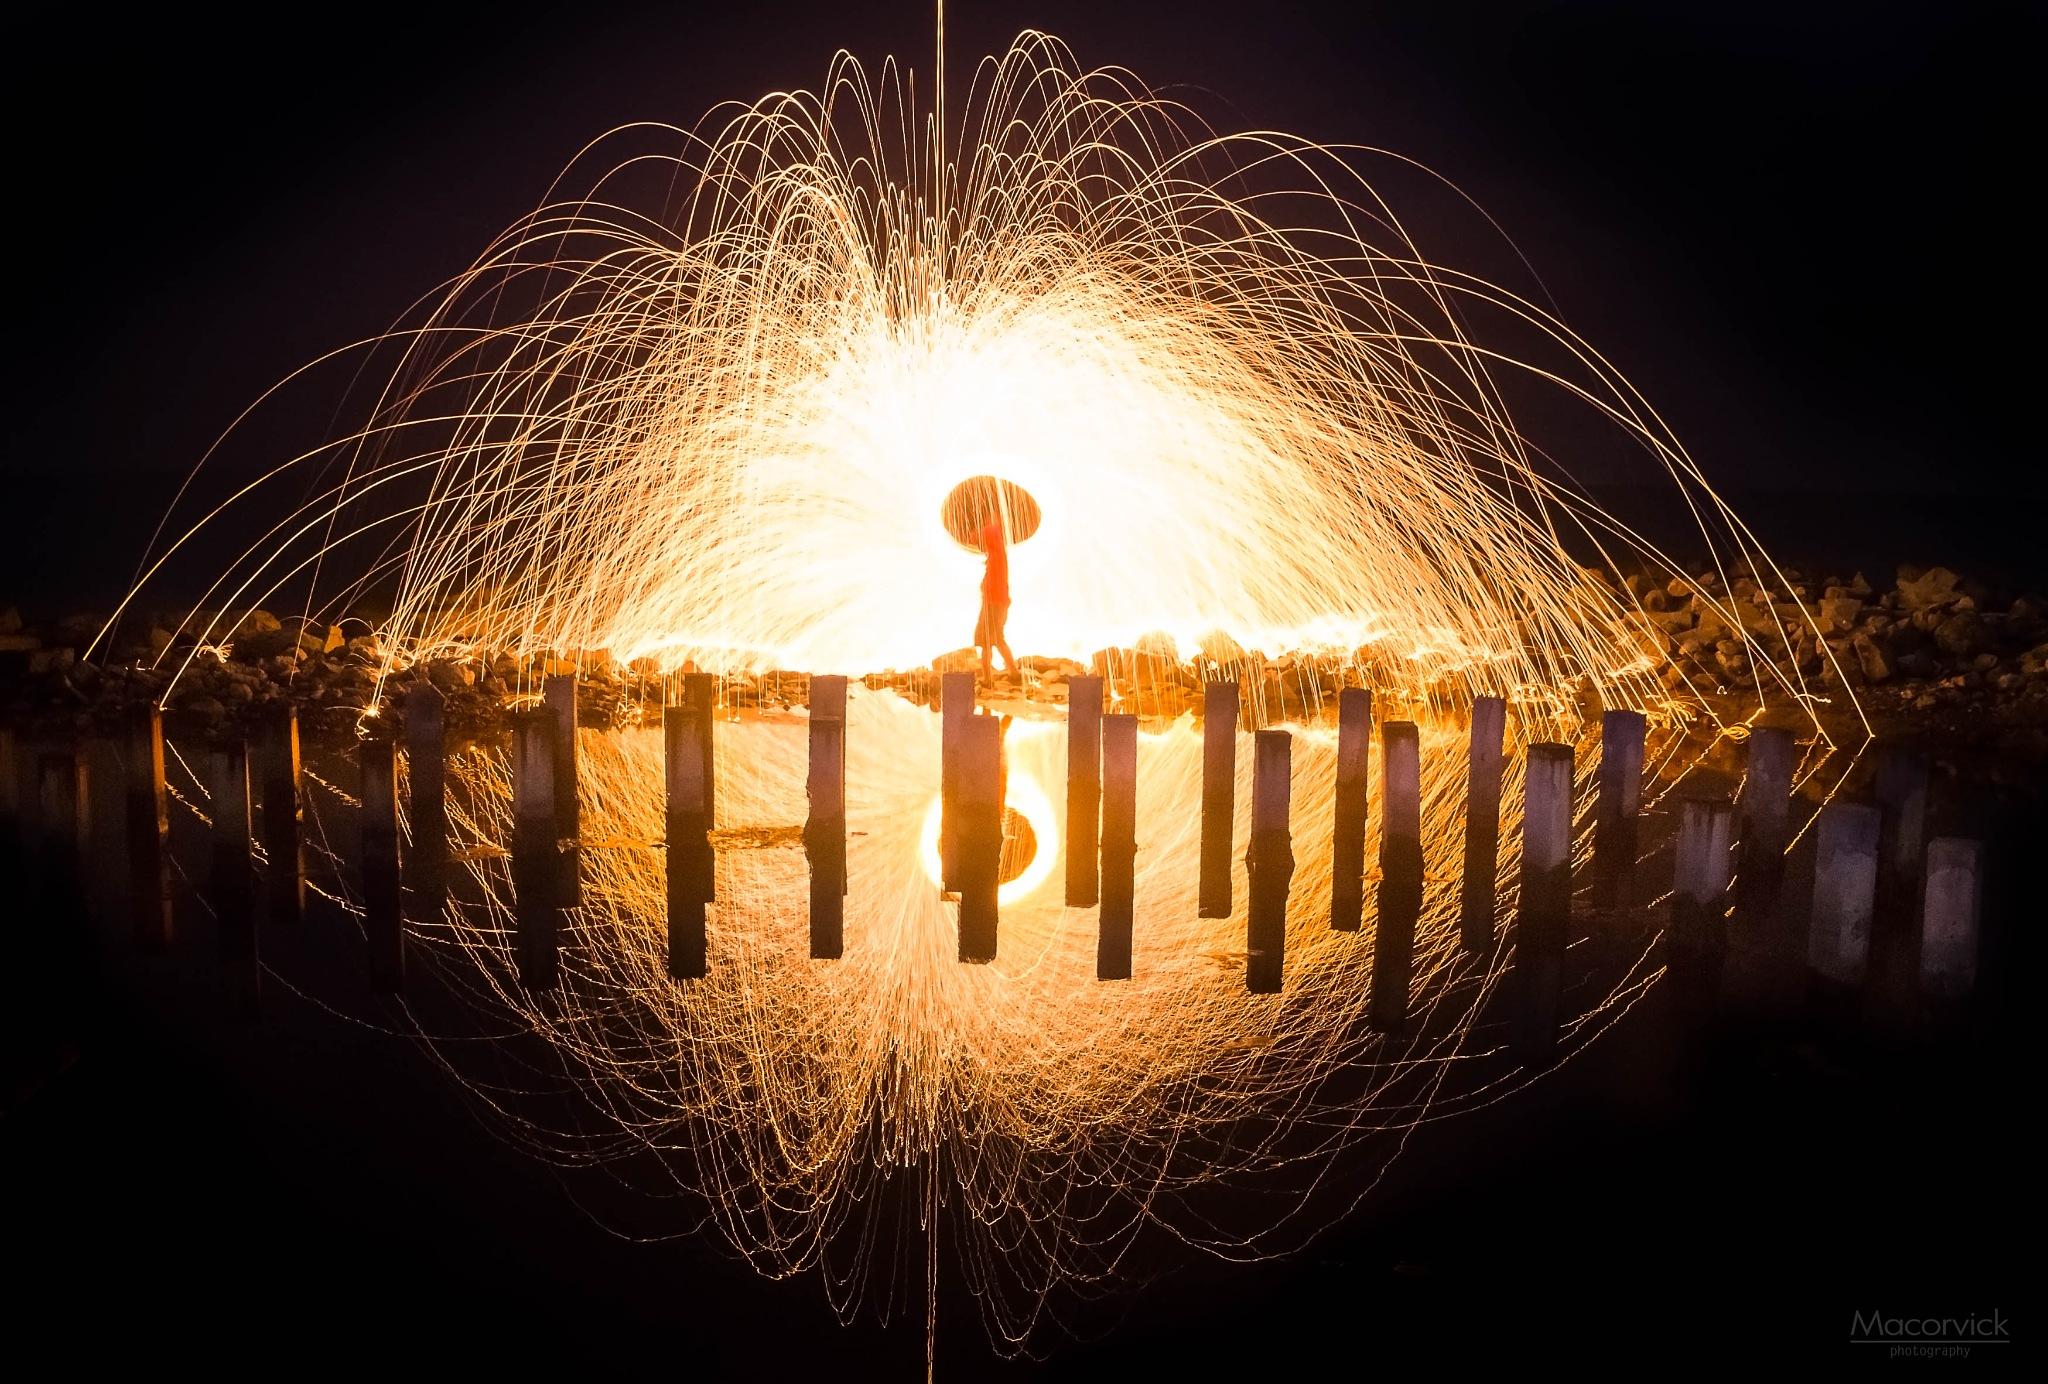 Light up my Way by Gerard Macorvick